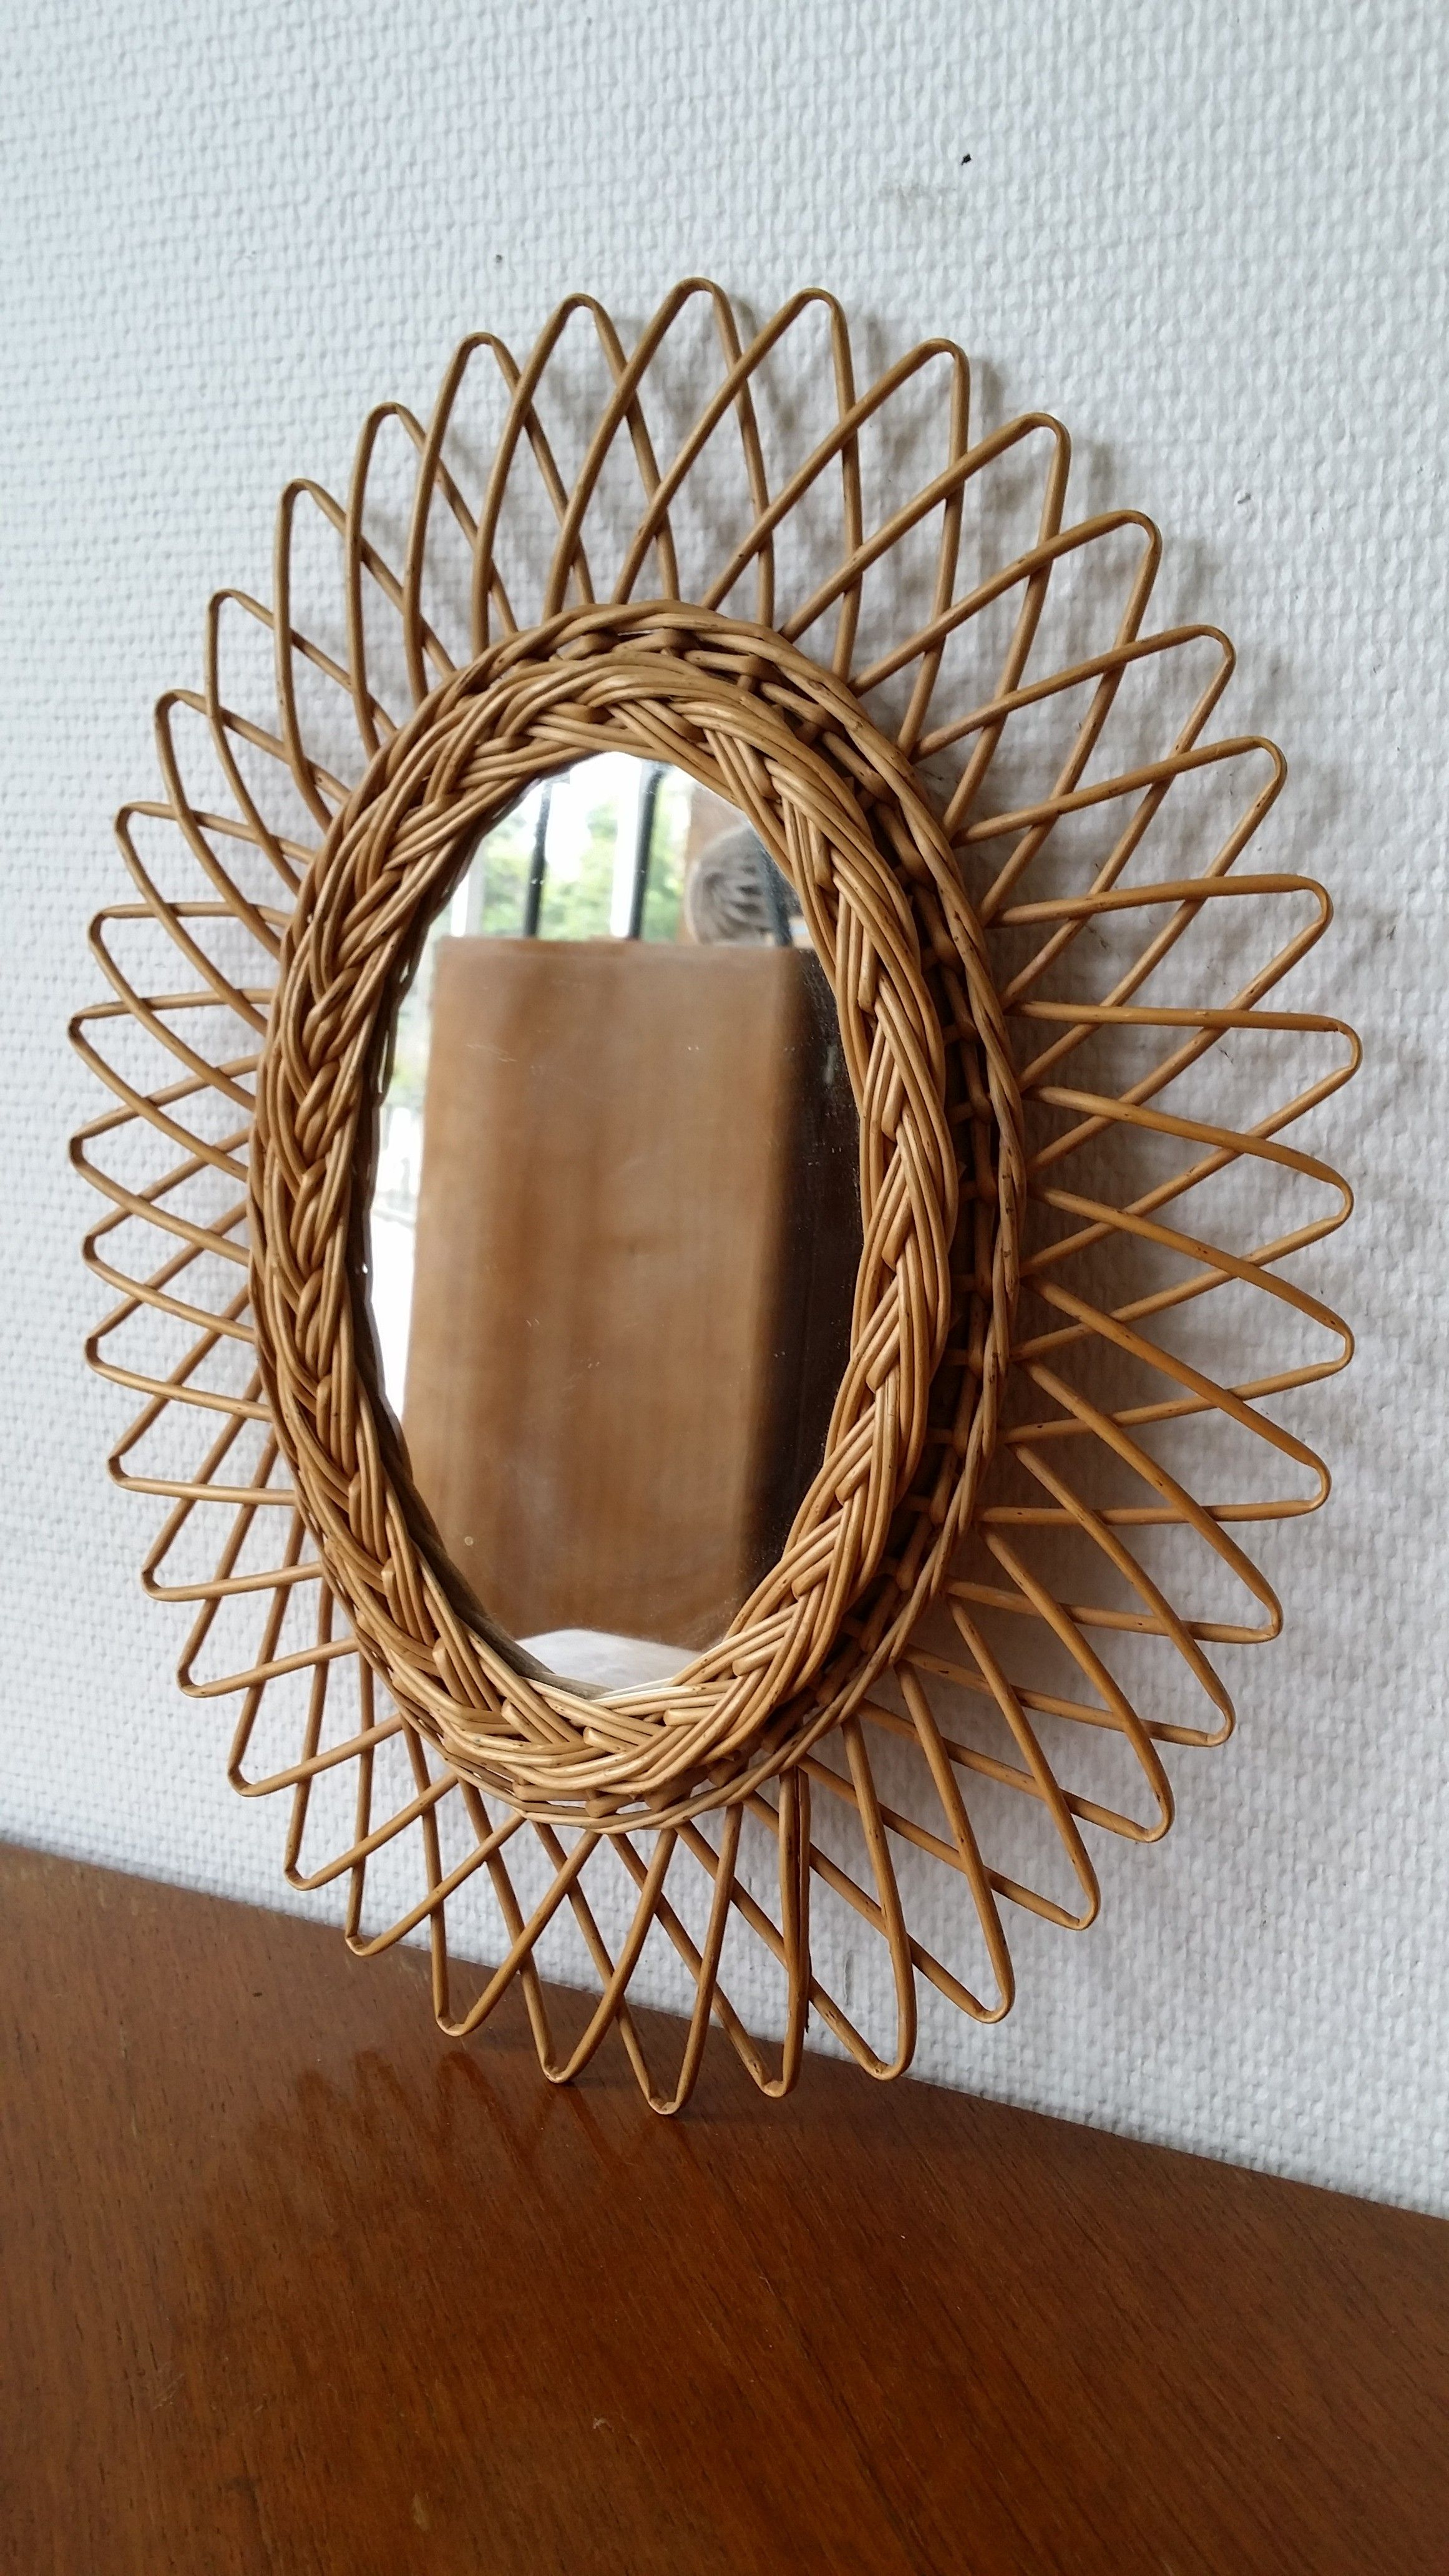 Un petit miroir soleil ovale en rotin mirror mirror pinterest for Miroir petit